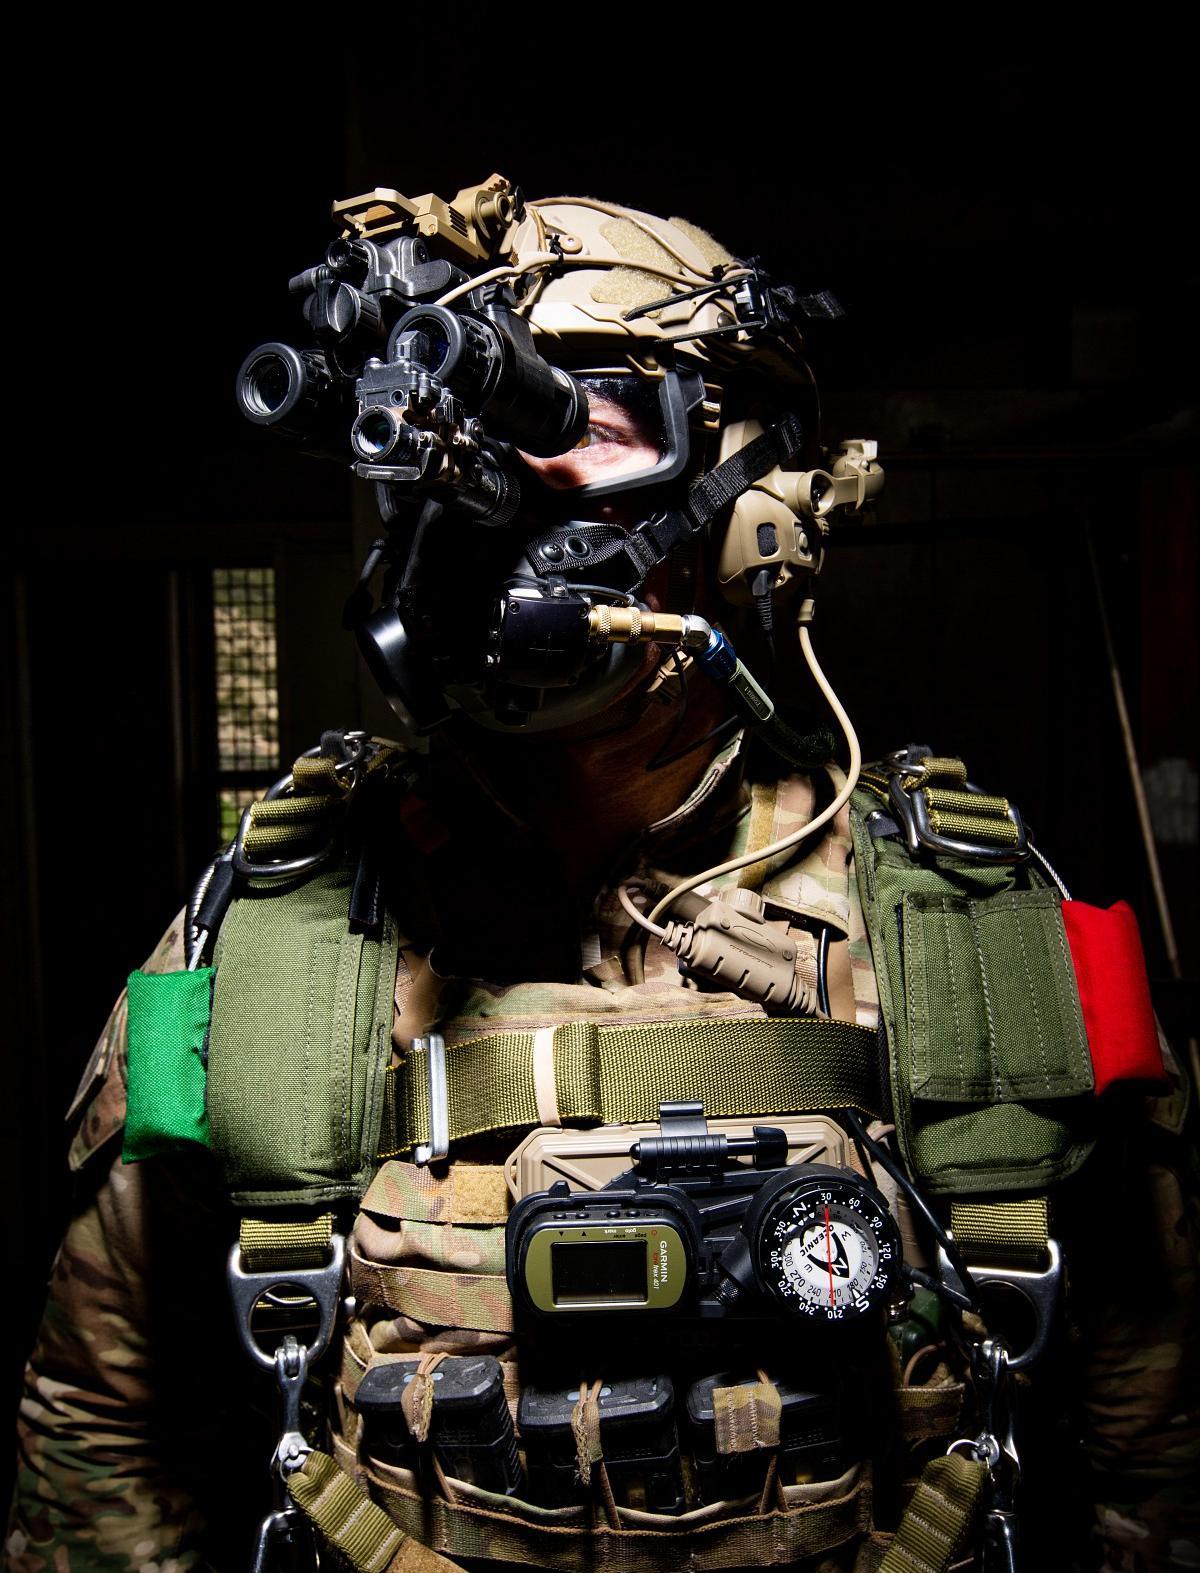 Parachute Jumpman with Enhanced Clip-On SWIR Imager (ECOSI)